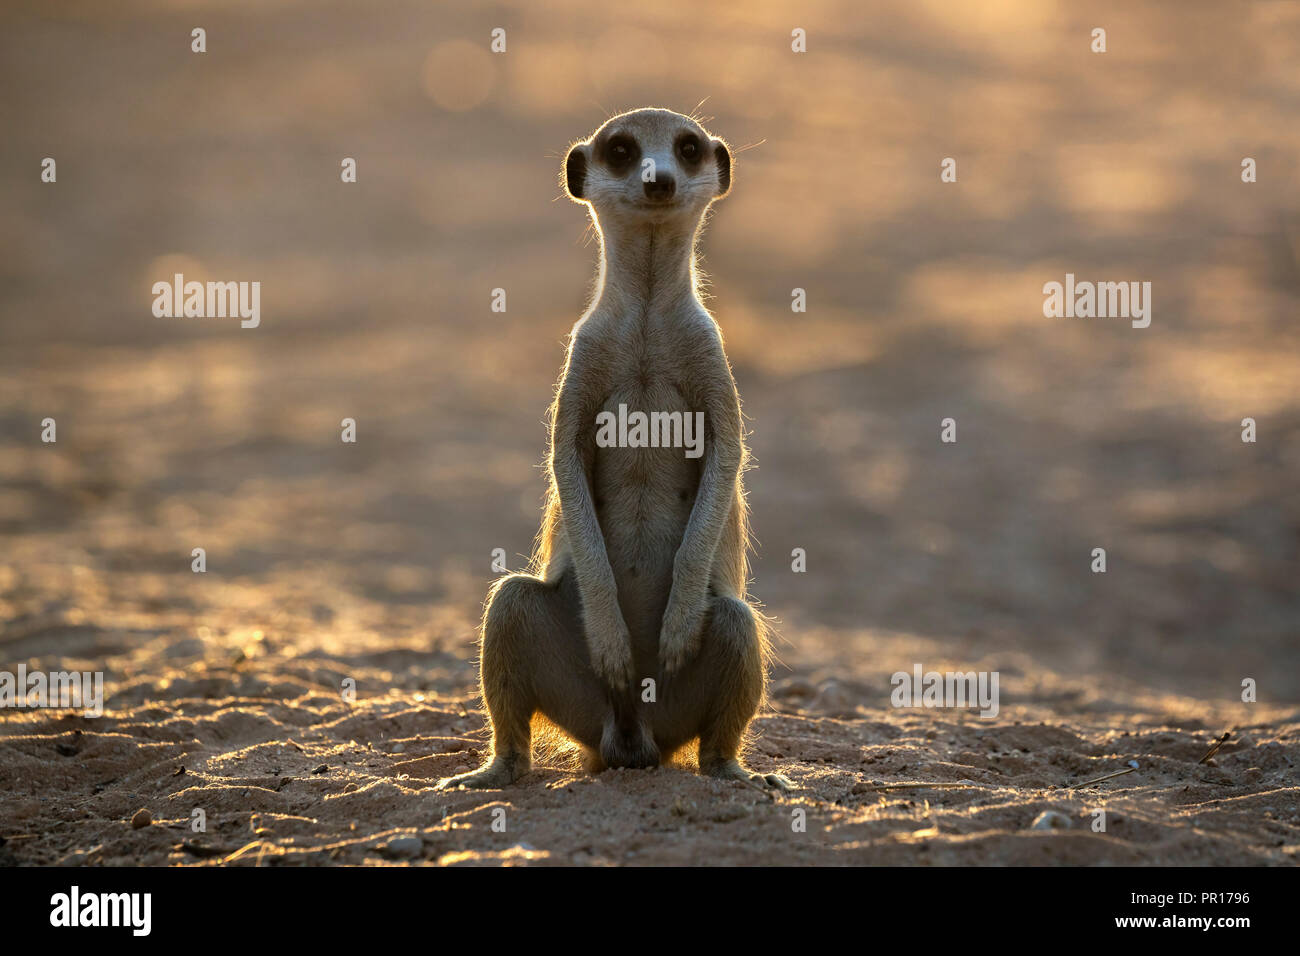 Meerkat (Suricata suricatta), Kgalagadi Transfrontier Park, Afrique du Sud, l'Afrique Photo Stock